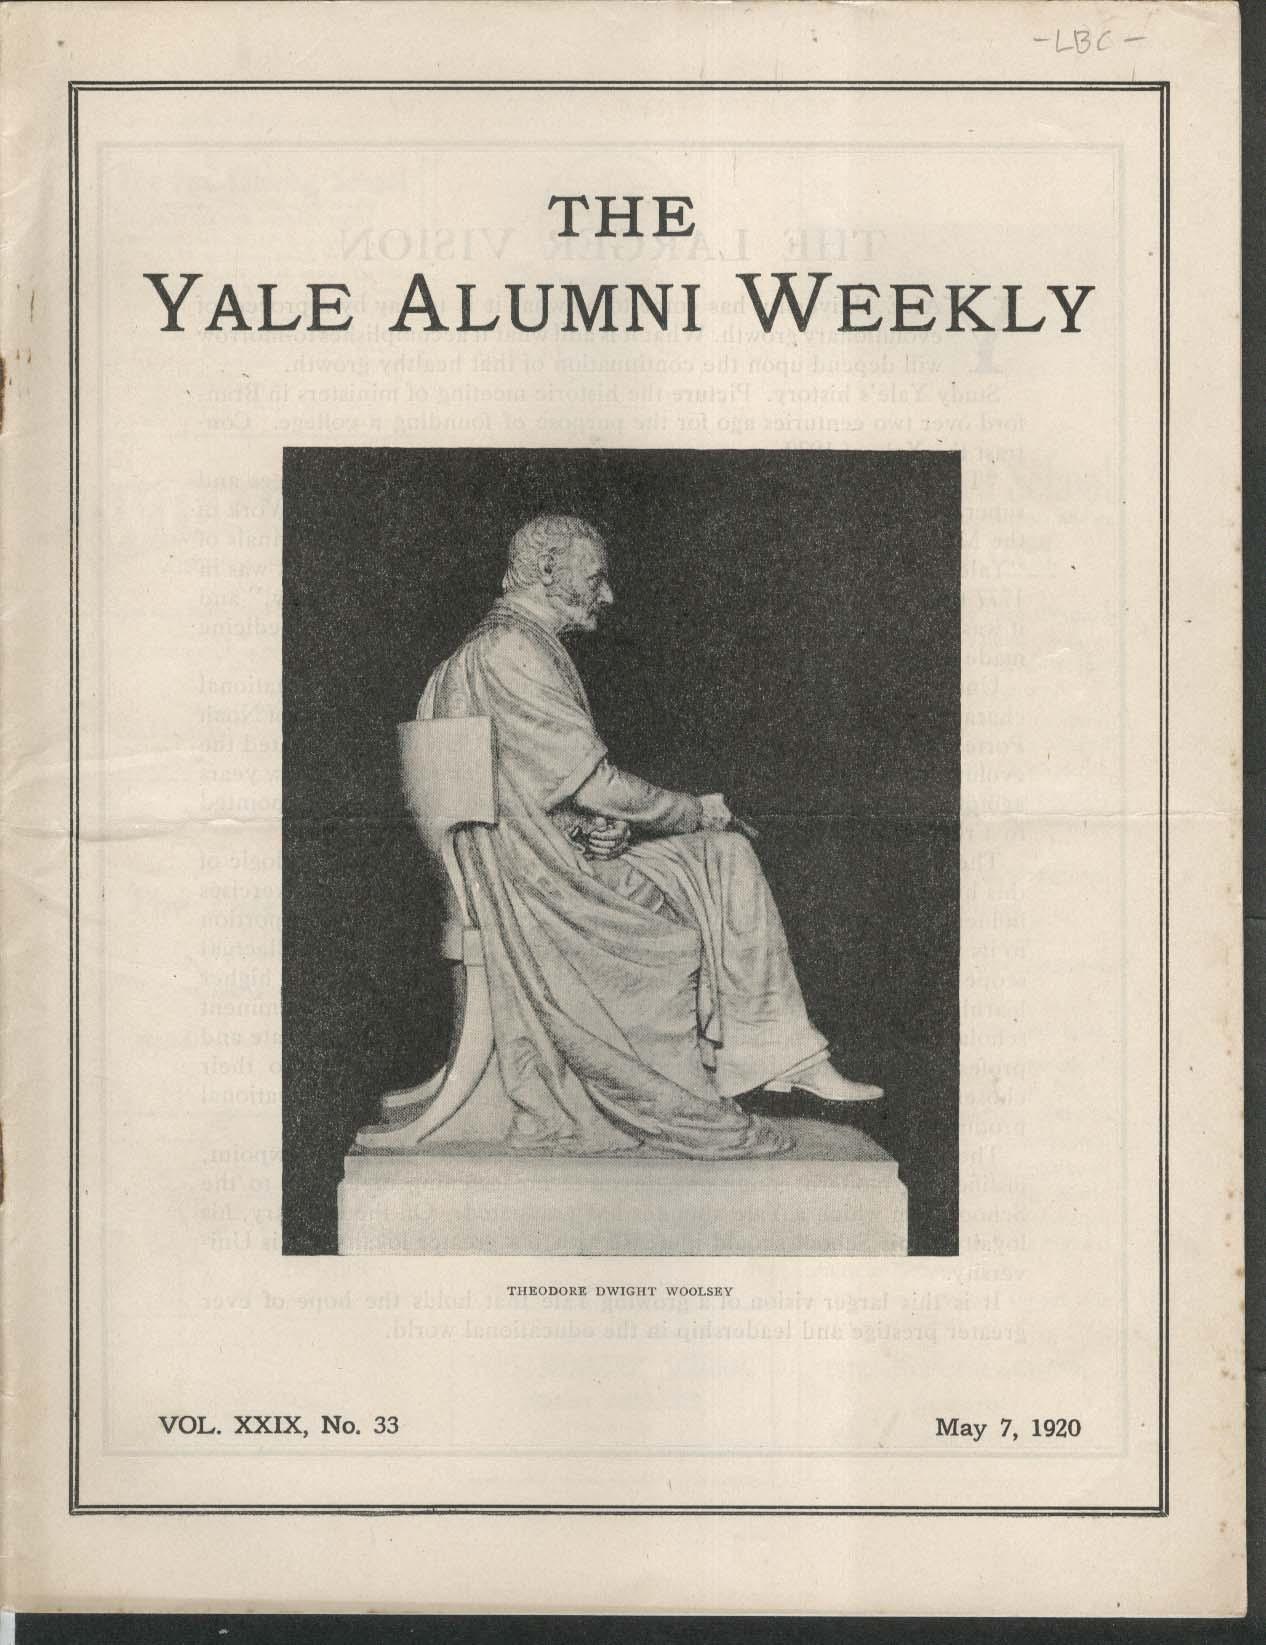 YALE ALUMNI WEEKLY Theodore Dwight Woolsey William Kendall 5/7 1920